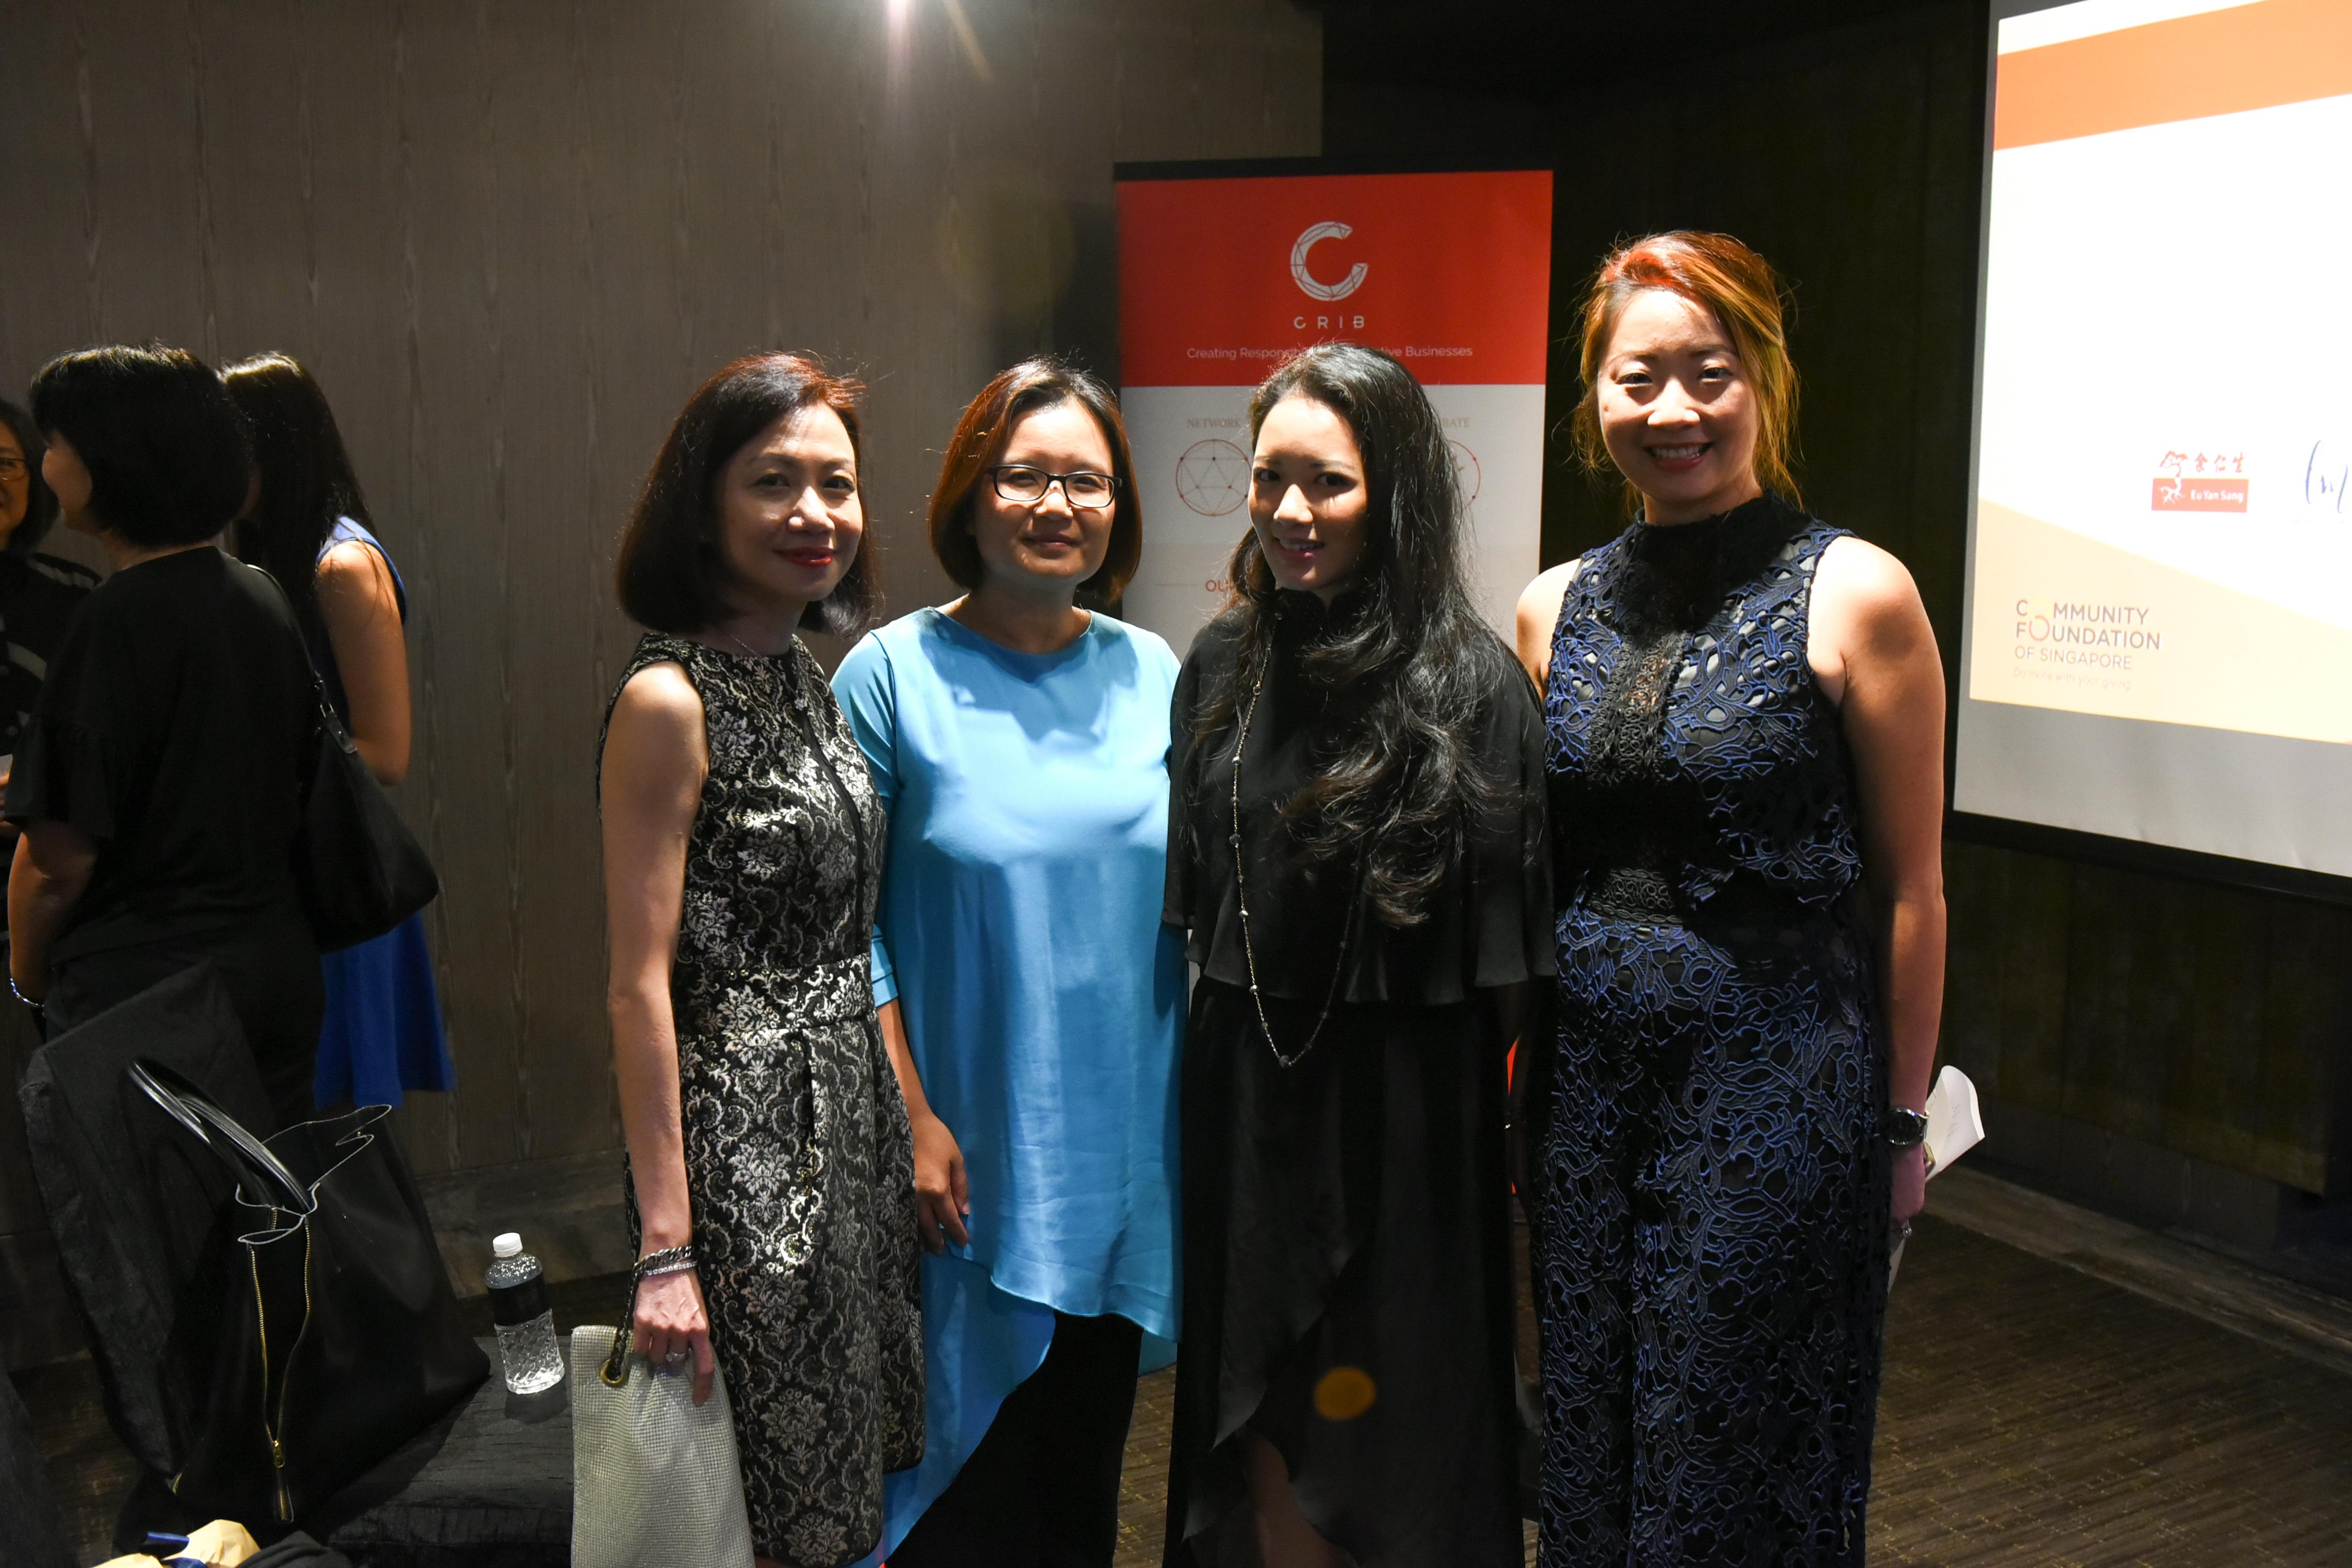 Catherine Loh, Patsian Low, Elaine Kim